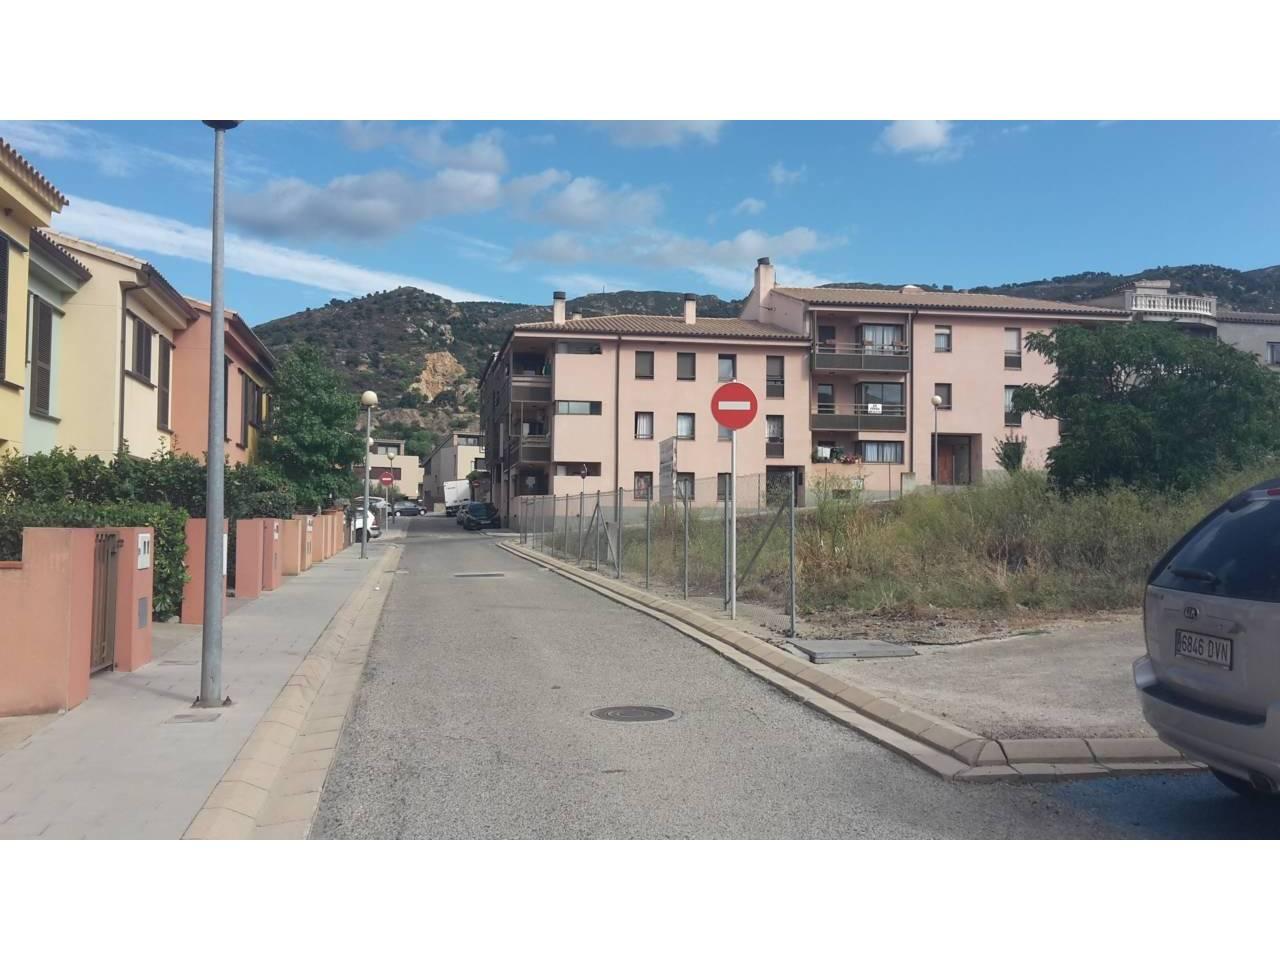 066234 - OLIVERA Parking